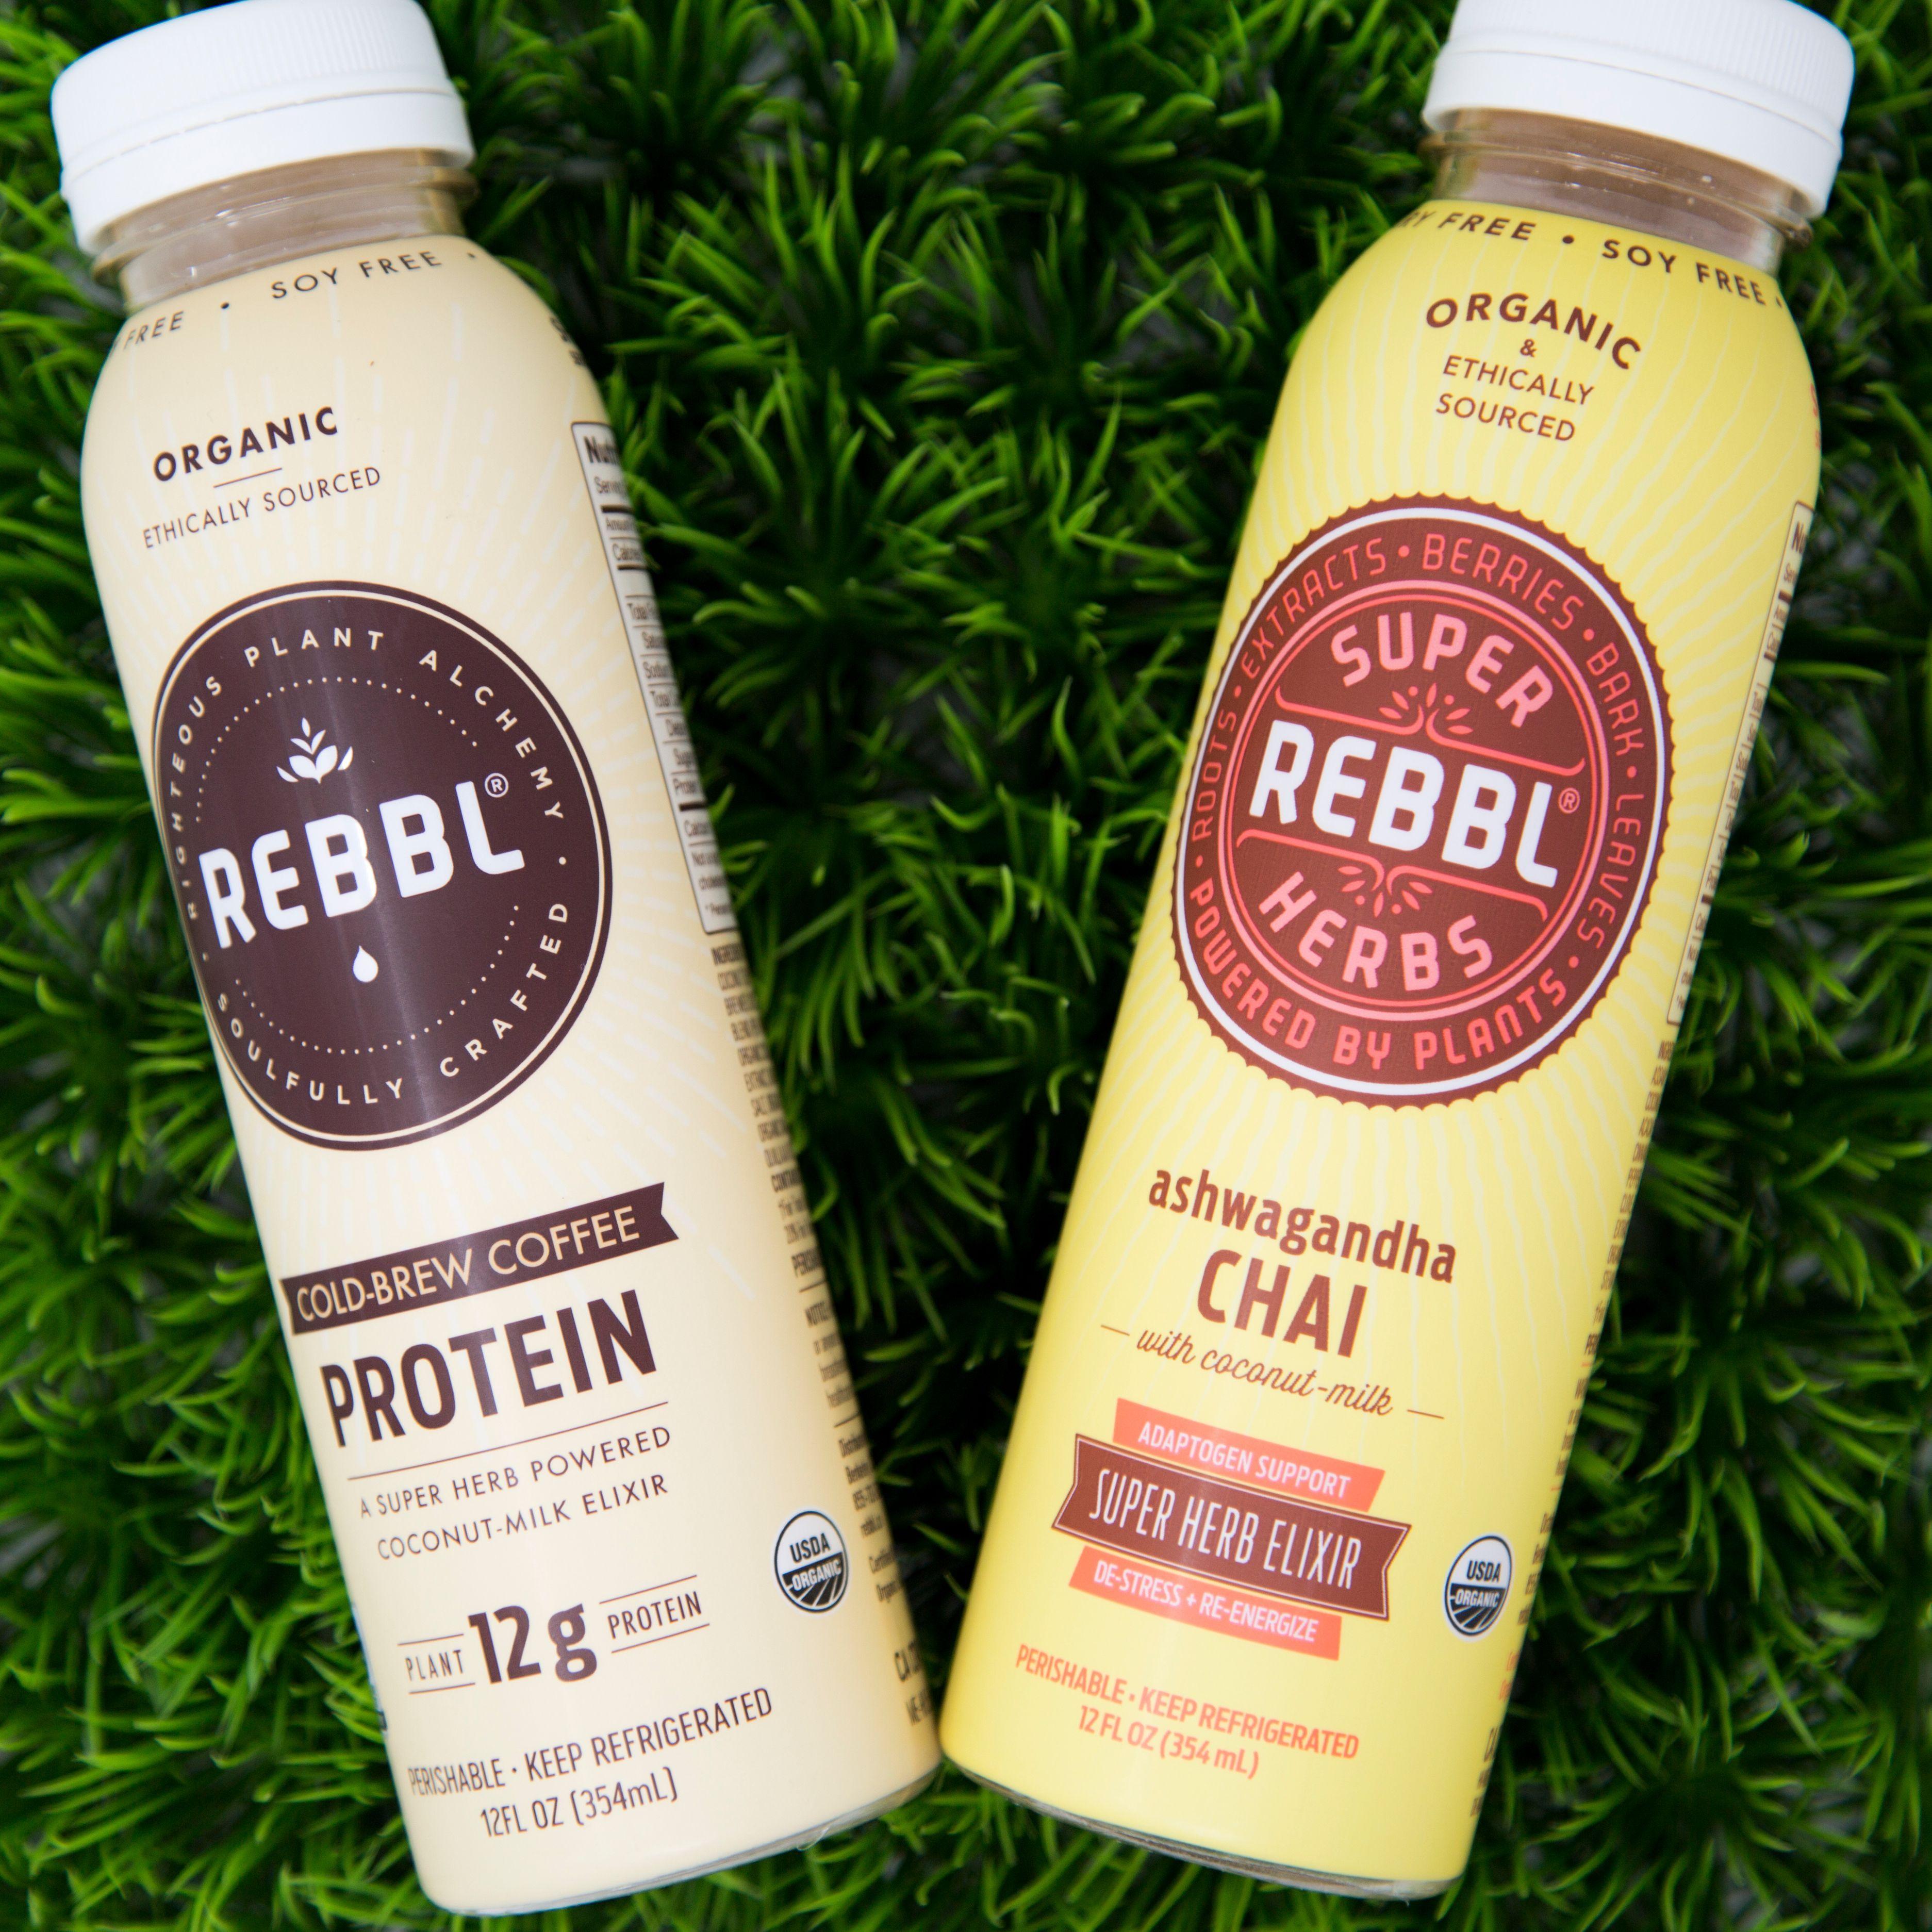 Rebbl Drink: Drinks, Coconut Protein, Food